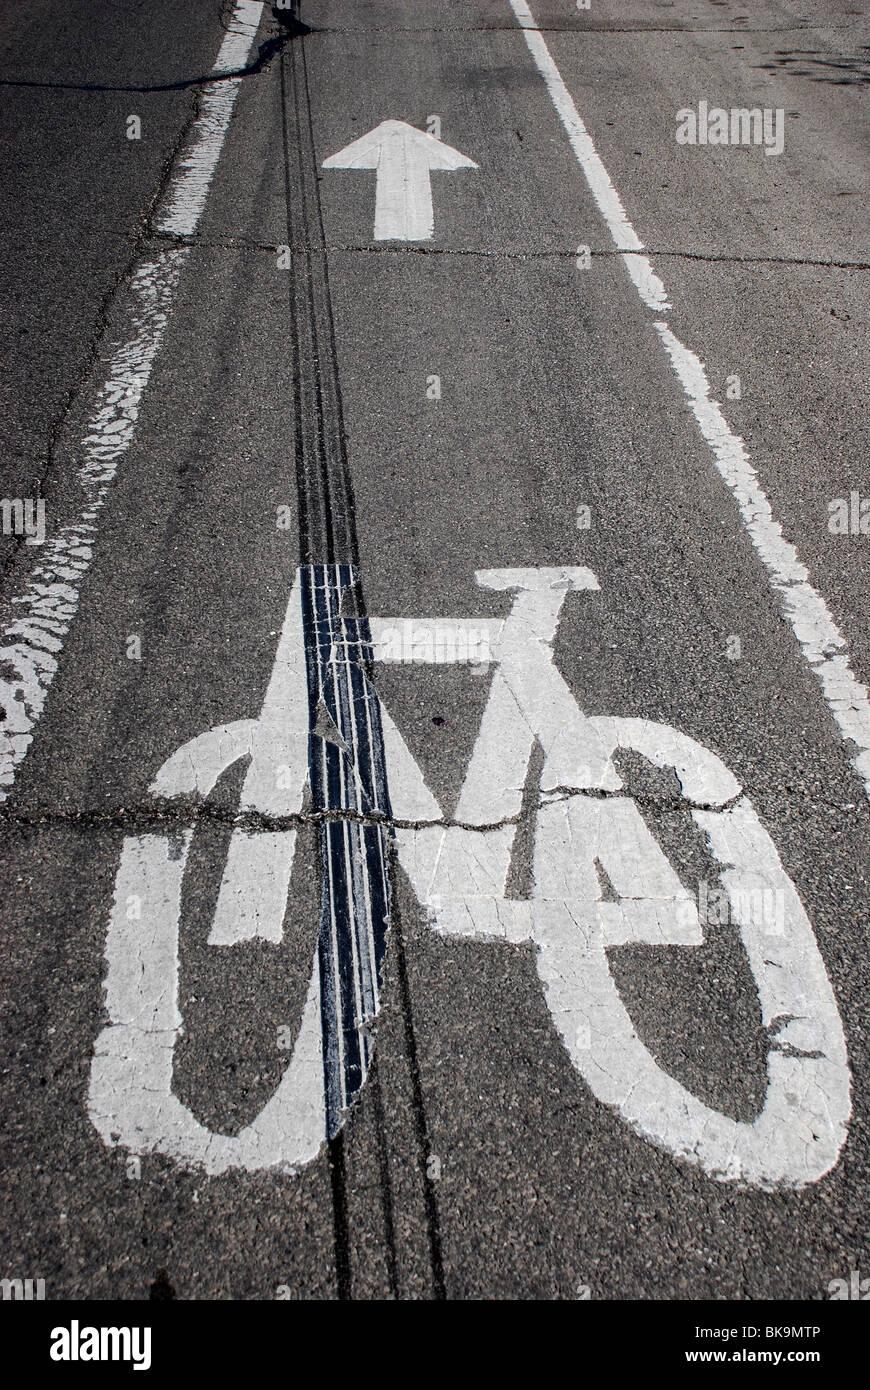 Bicycle path - Stock Image